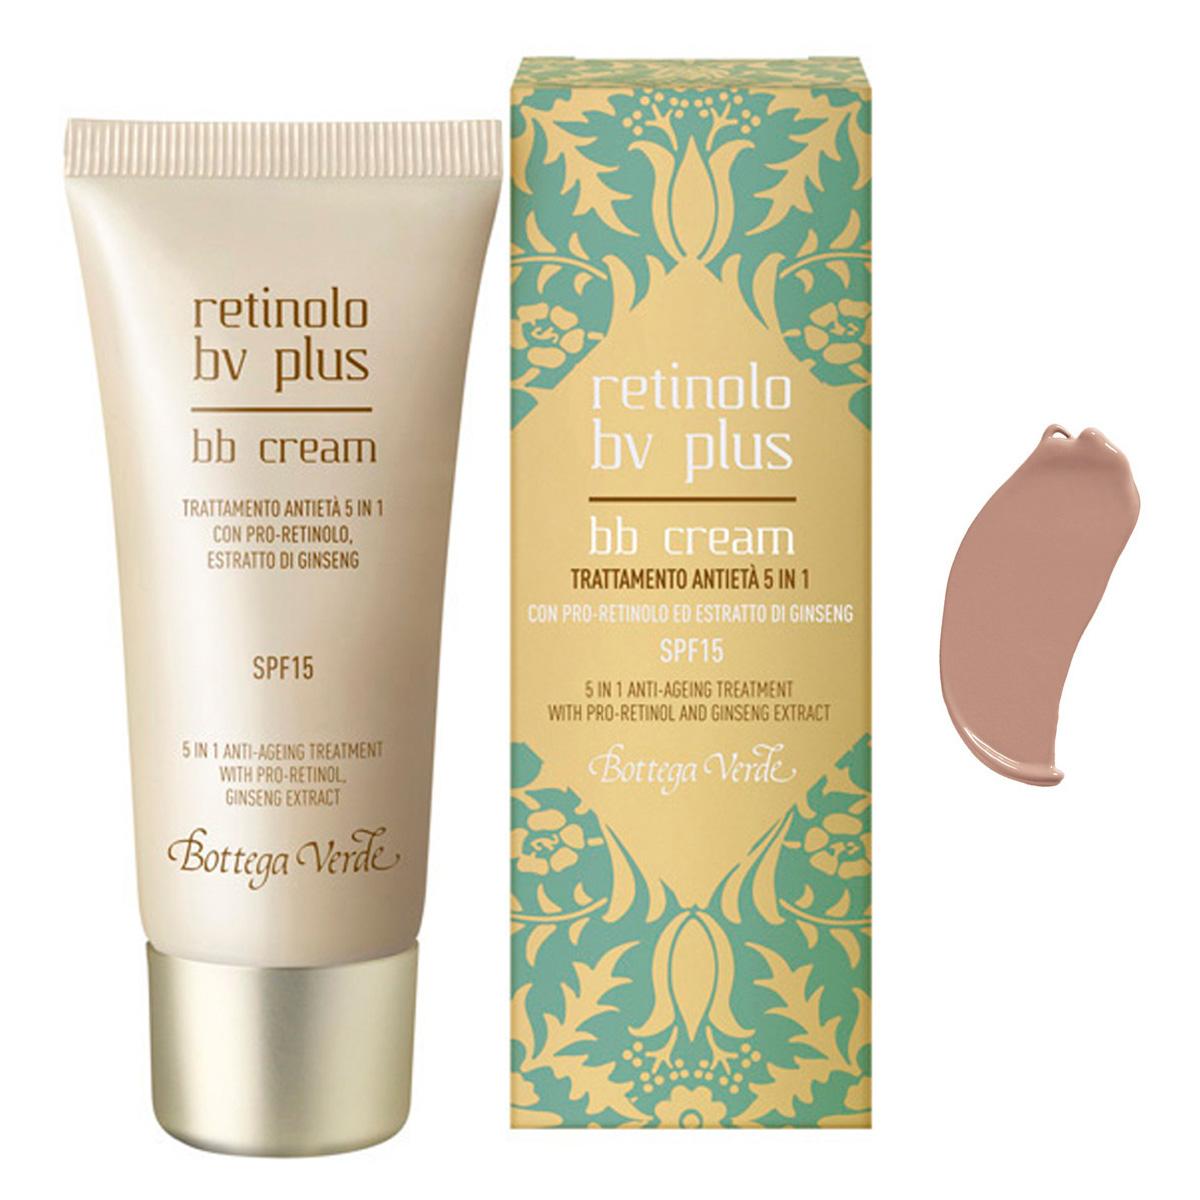 Retinolo Bv Plus - BB Cream, tratament anti-imbatranire 5 in 1, cu Pro-Retinol, extract de ginseng, SPF 15 - maro aluna